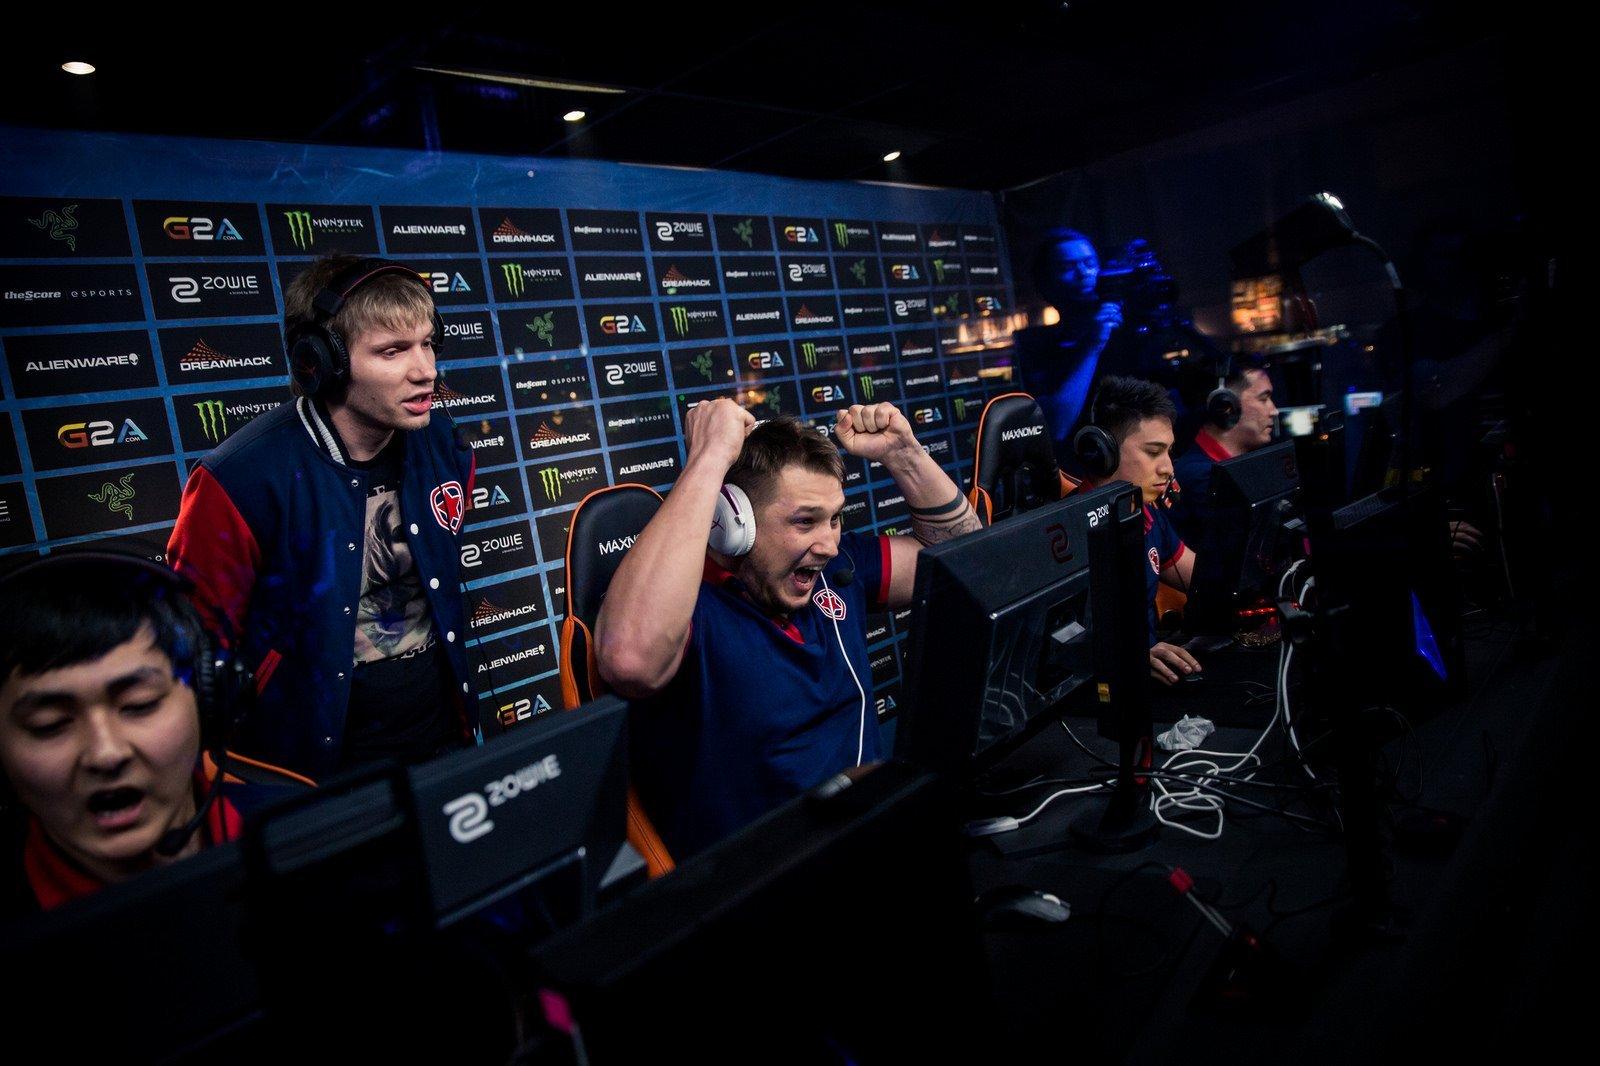 Natus Vincere - Gambit Esports